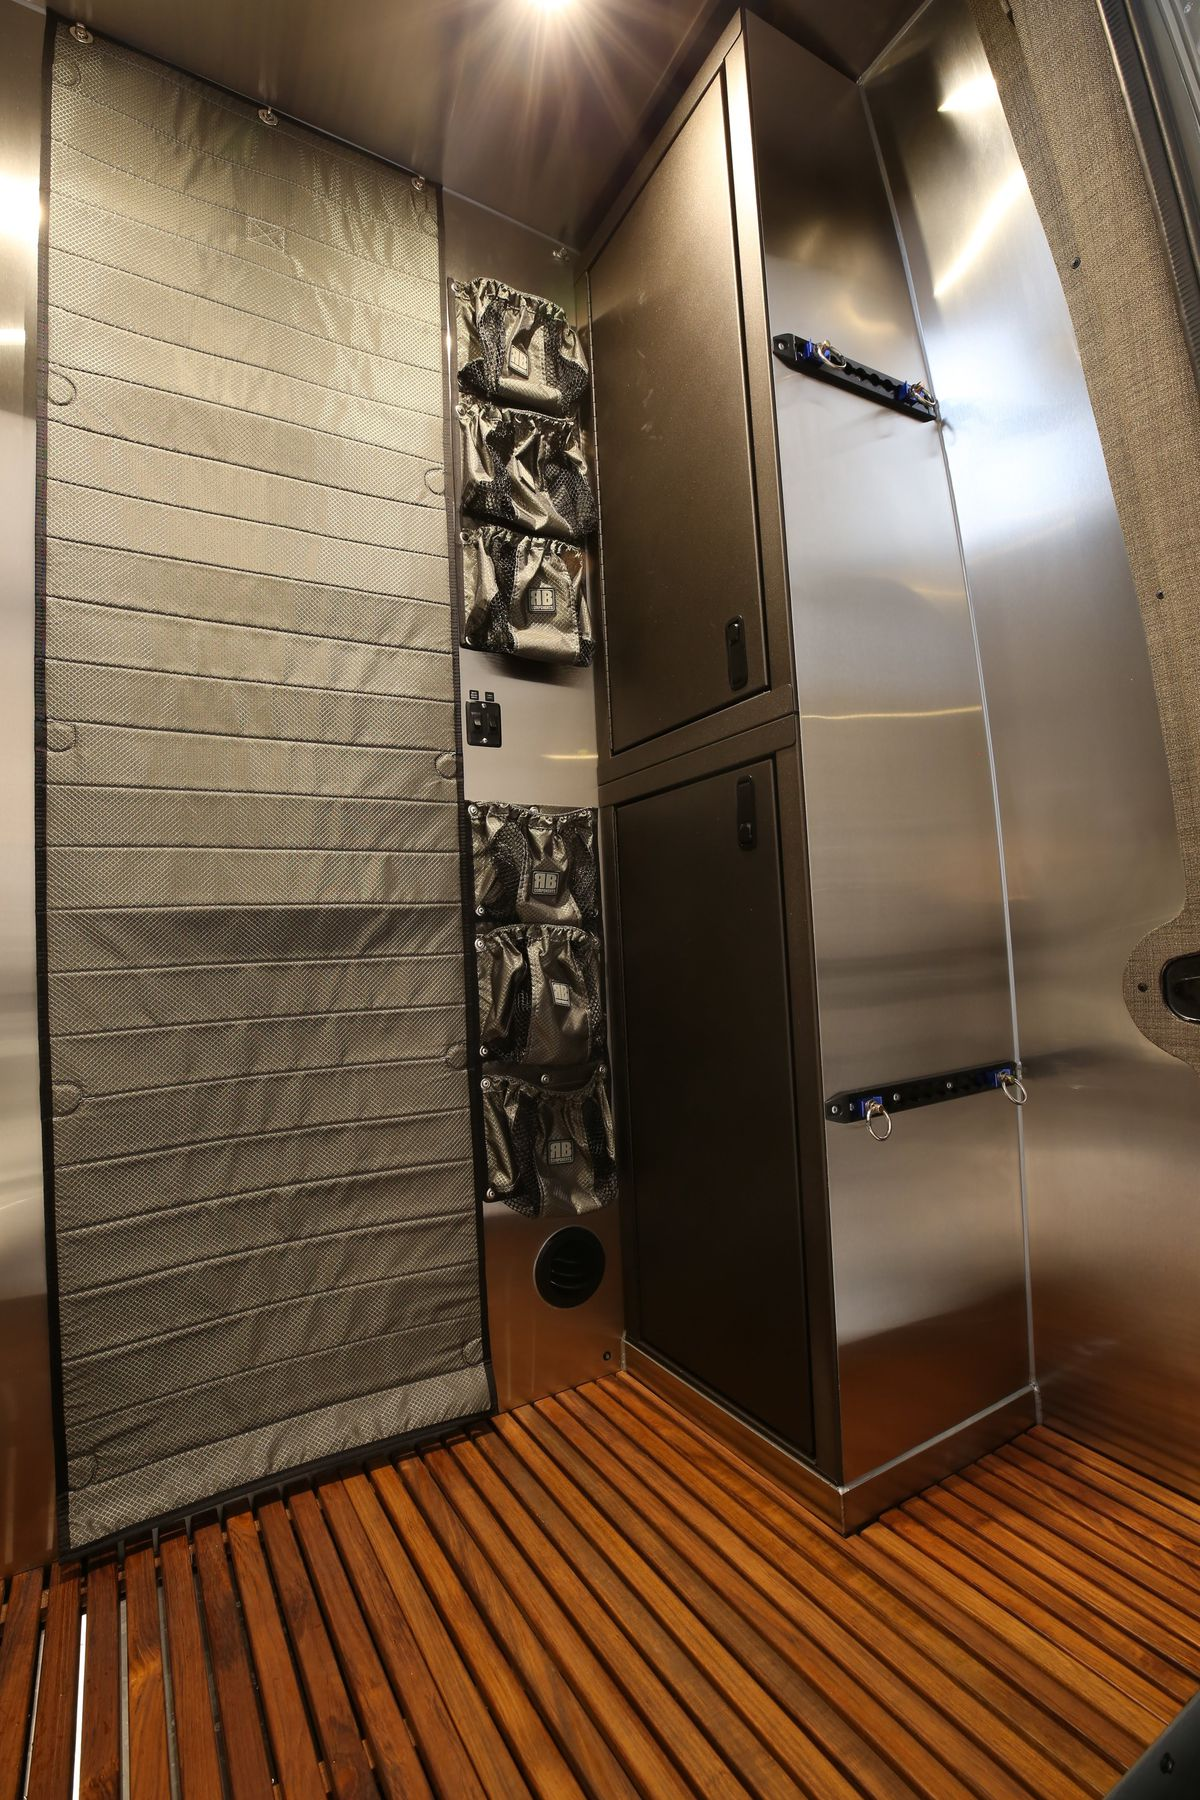 Pleasant Camper Van Sleeps Four And Hides A Clever Bathroom Curbed Creativecarmelina Interior Chair Design Creativecarmelinacom